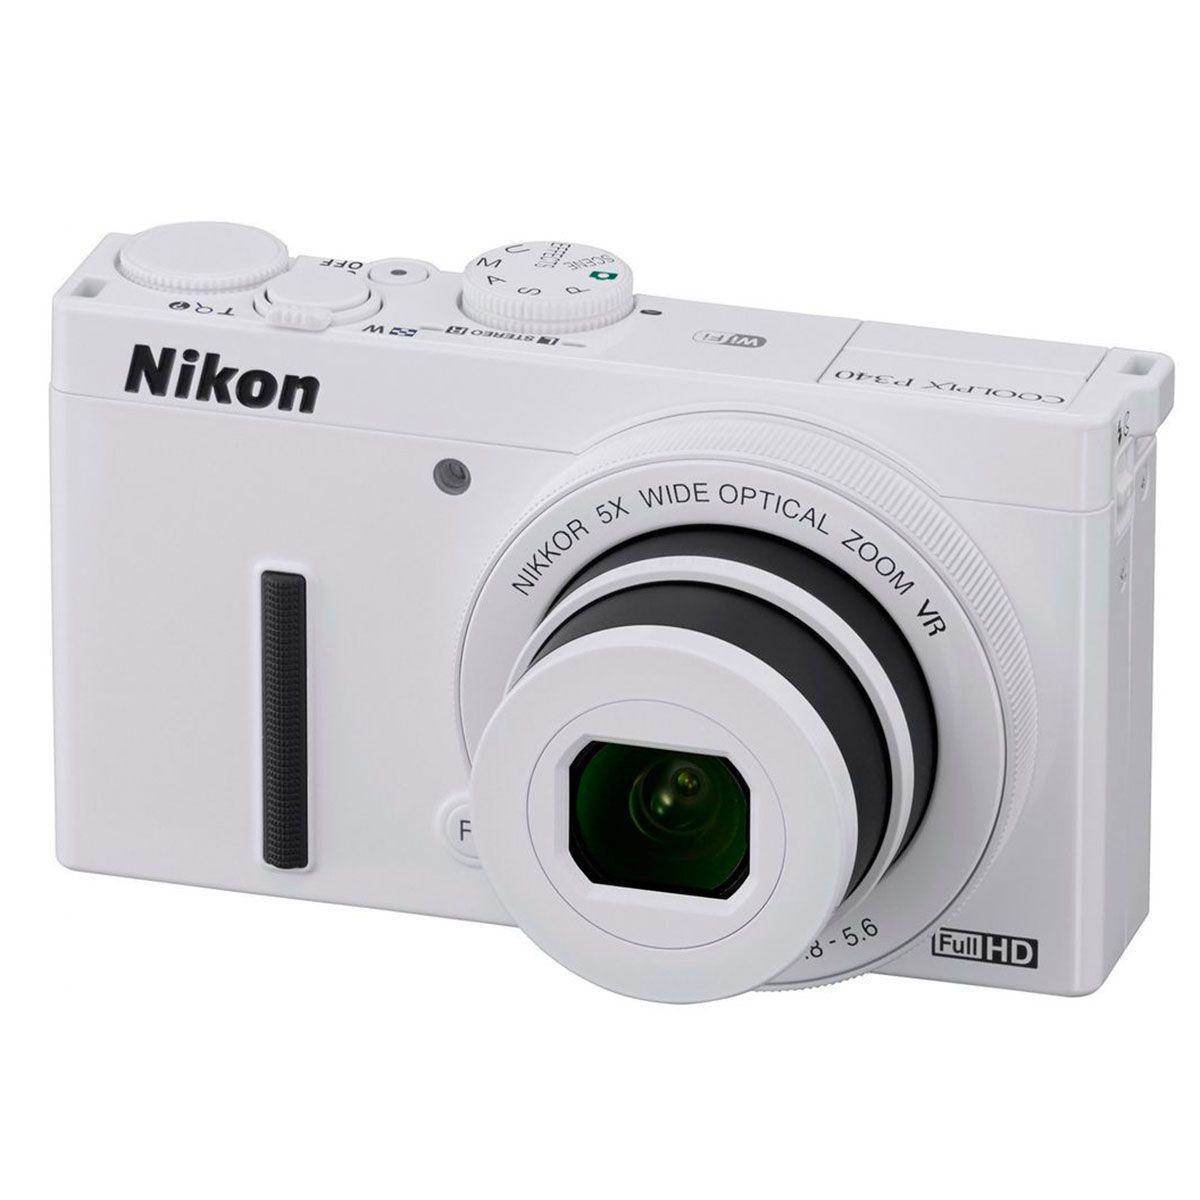 Nikon Coolpix P340 Compact Camera review